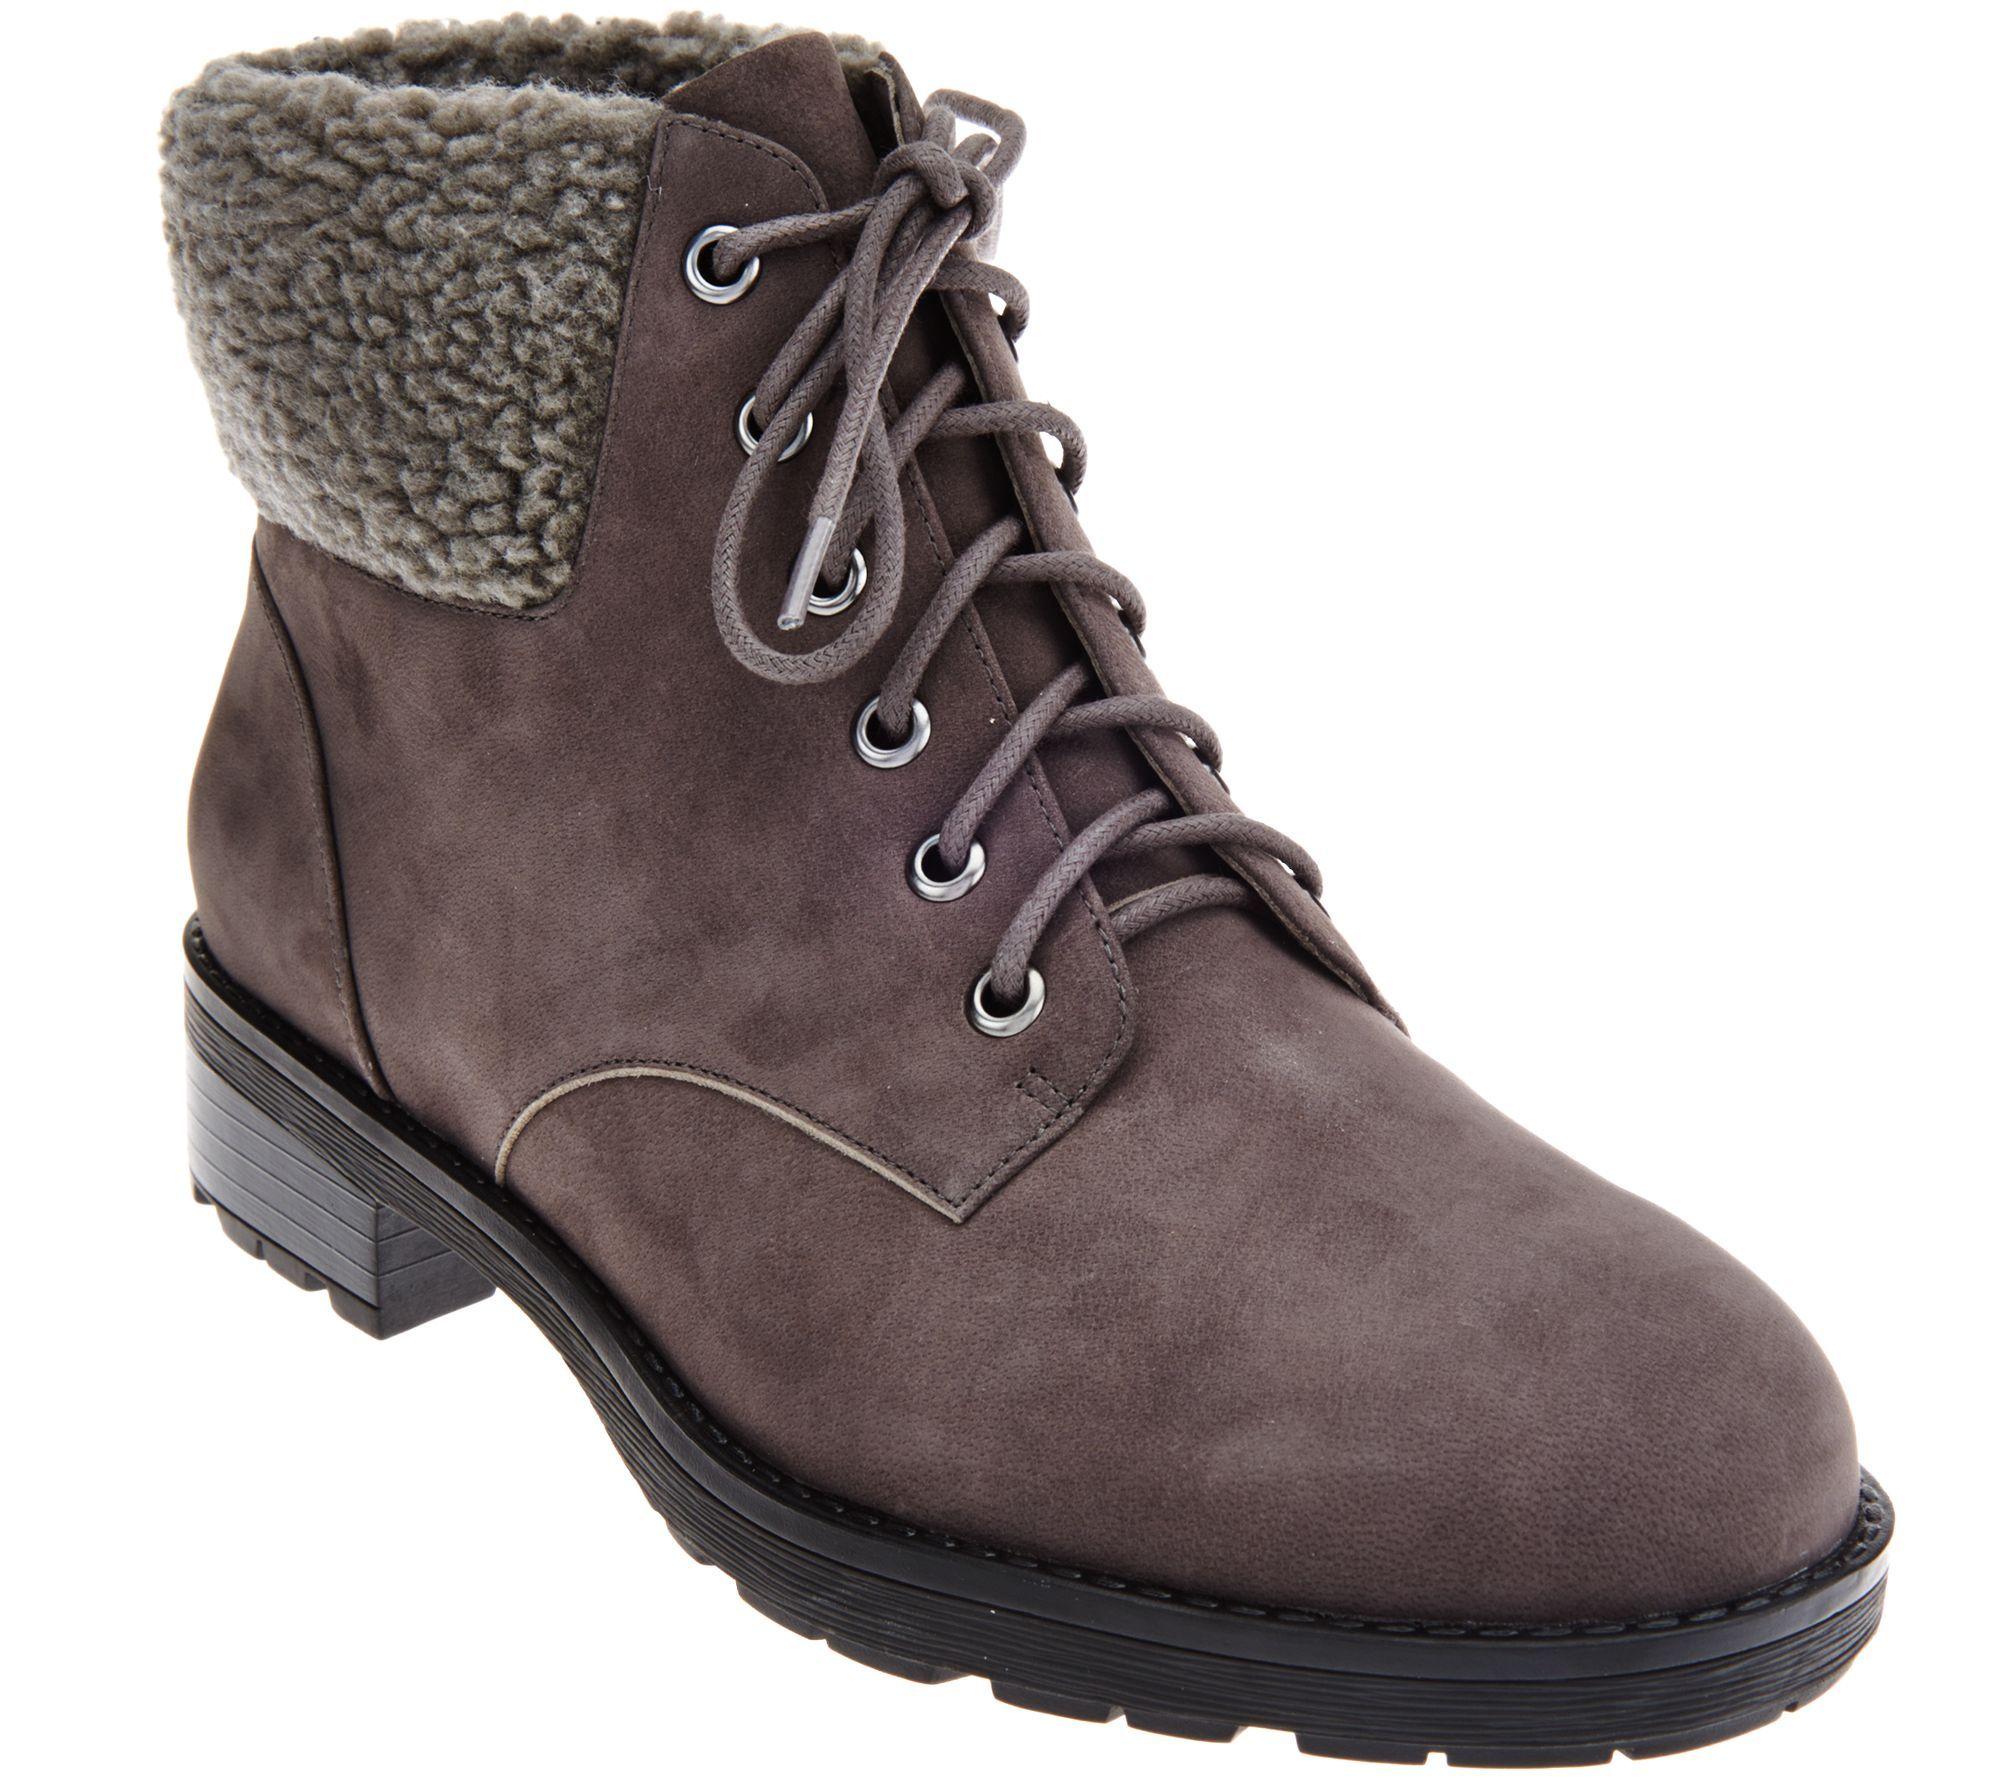 58726aa0fa15 Vionic Orthotic Lace-up Boots w  Faux Fur Trim - Lolland( 180 ...